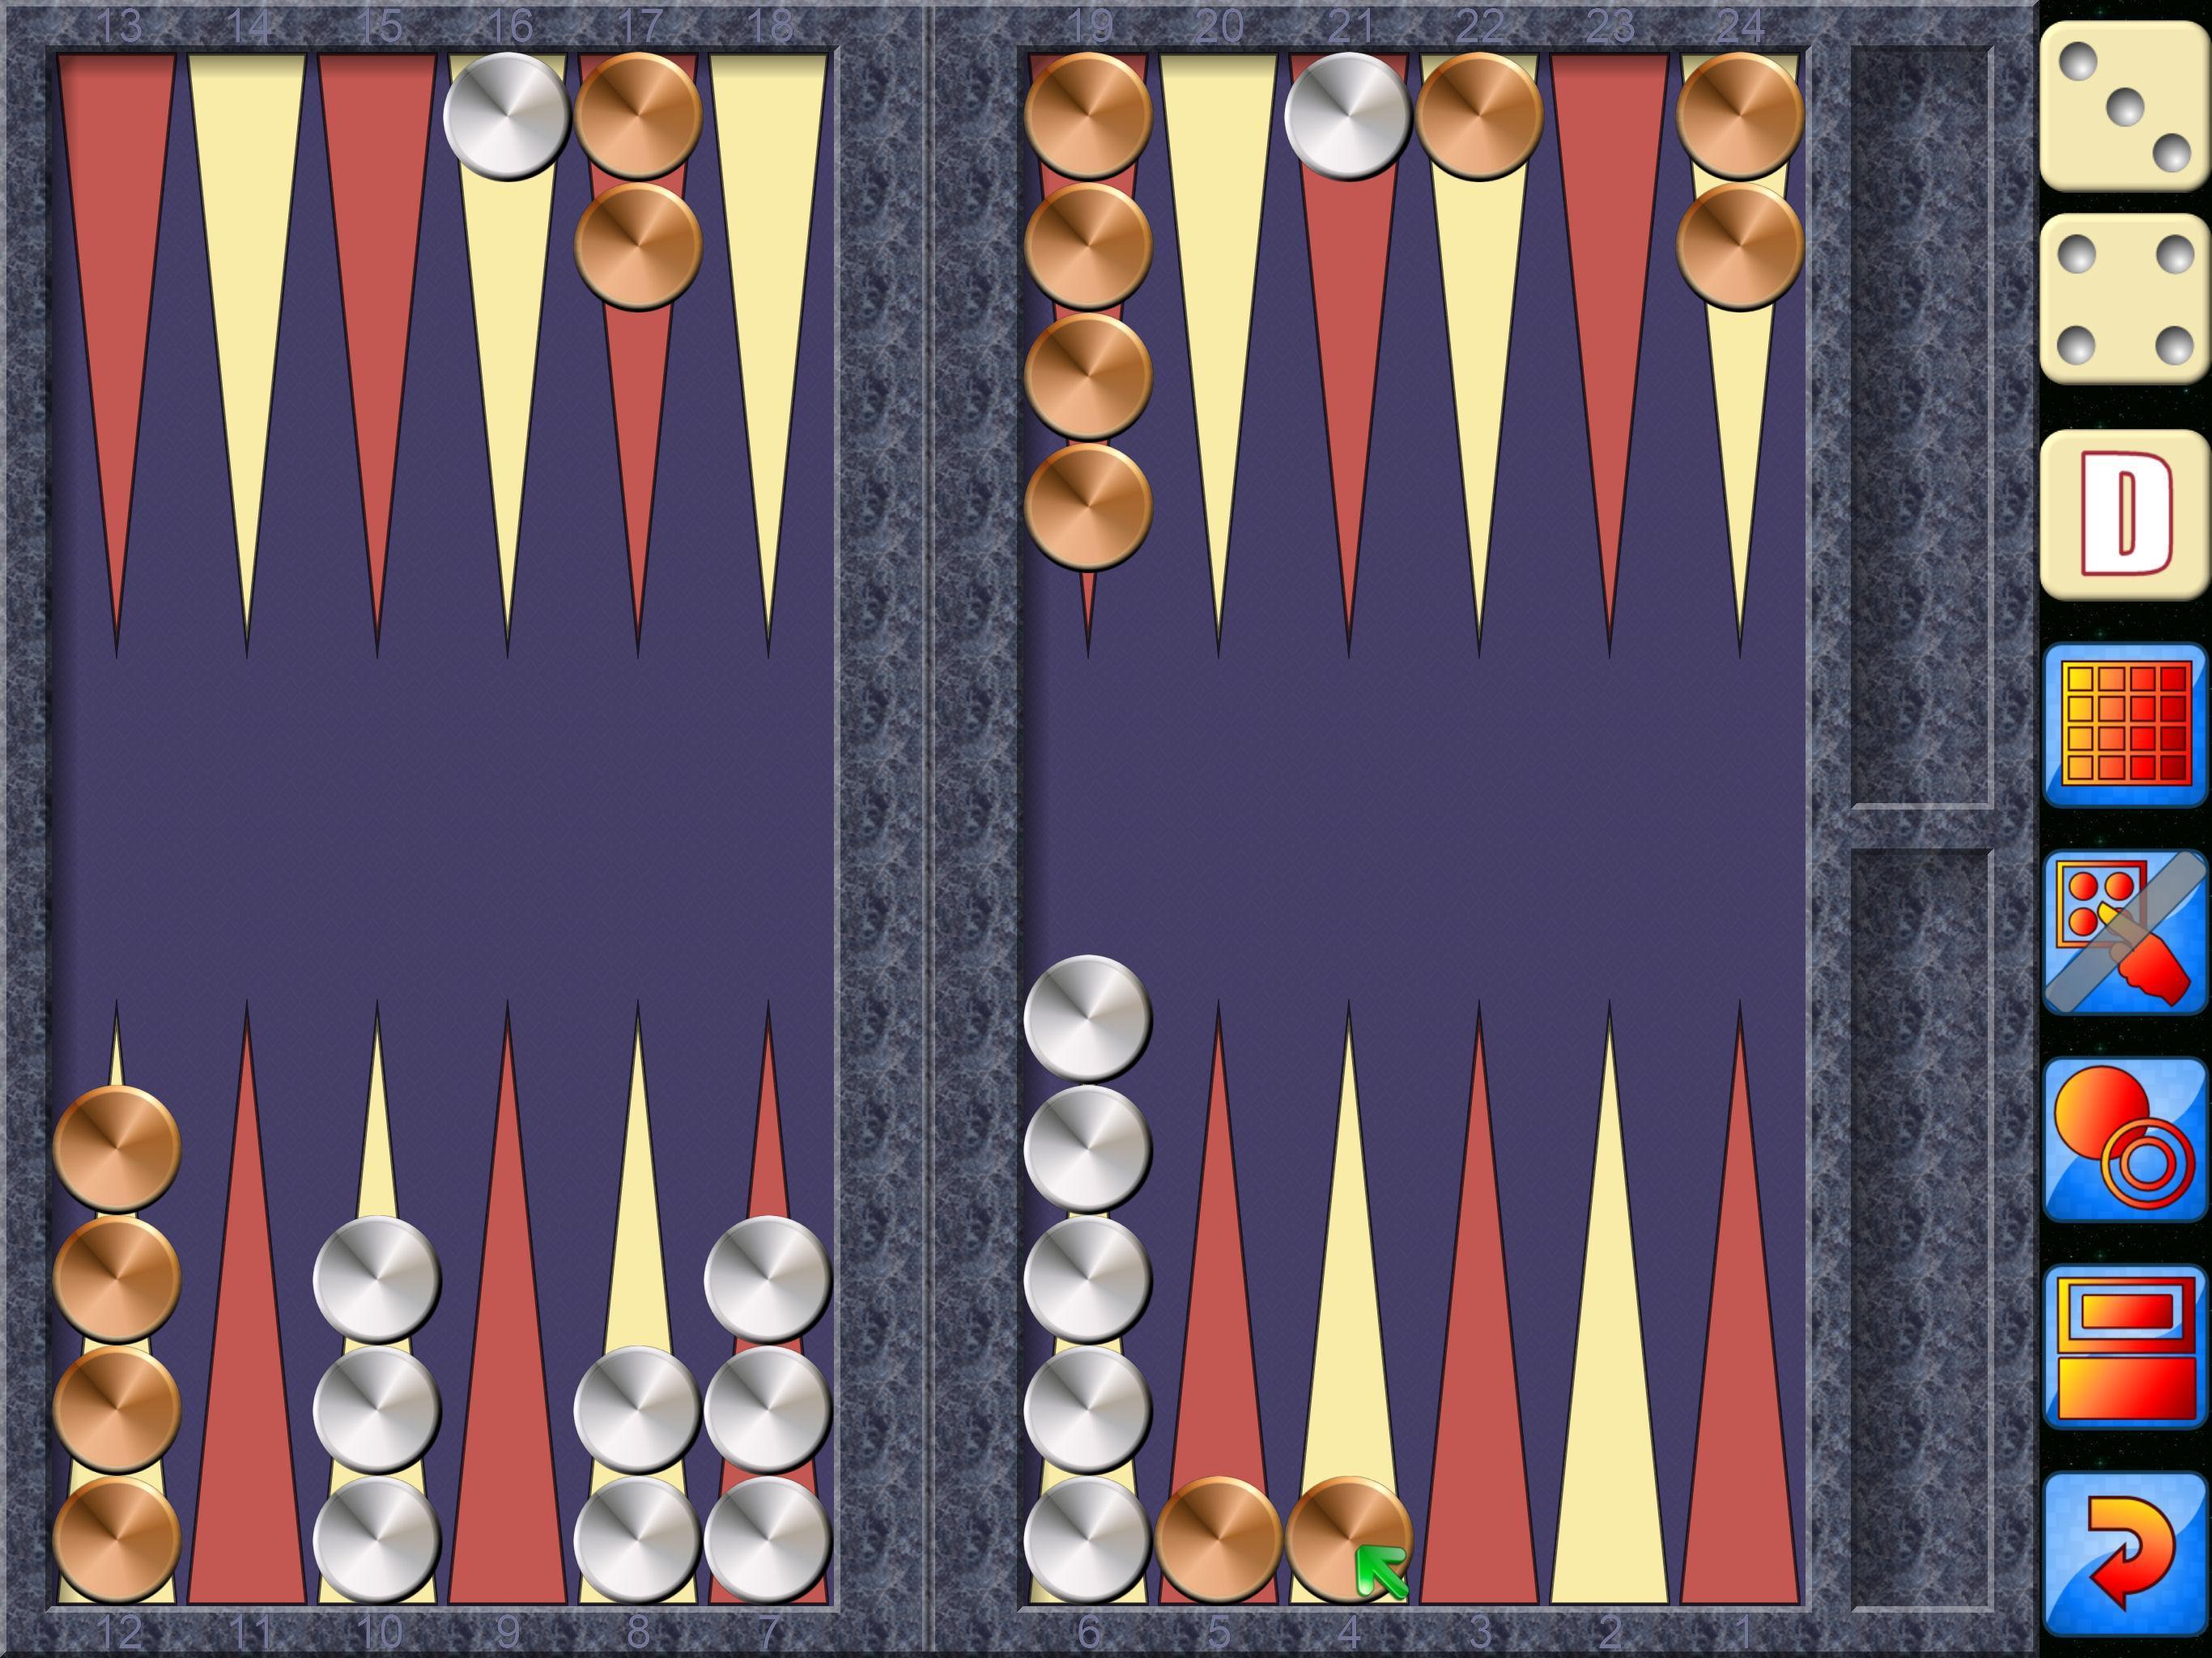 Backgammon V+, online multiplayer backgammon 5.25.64 Screenshot 12